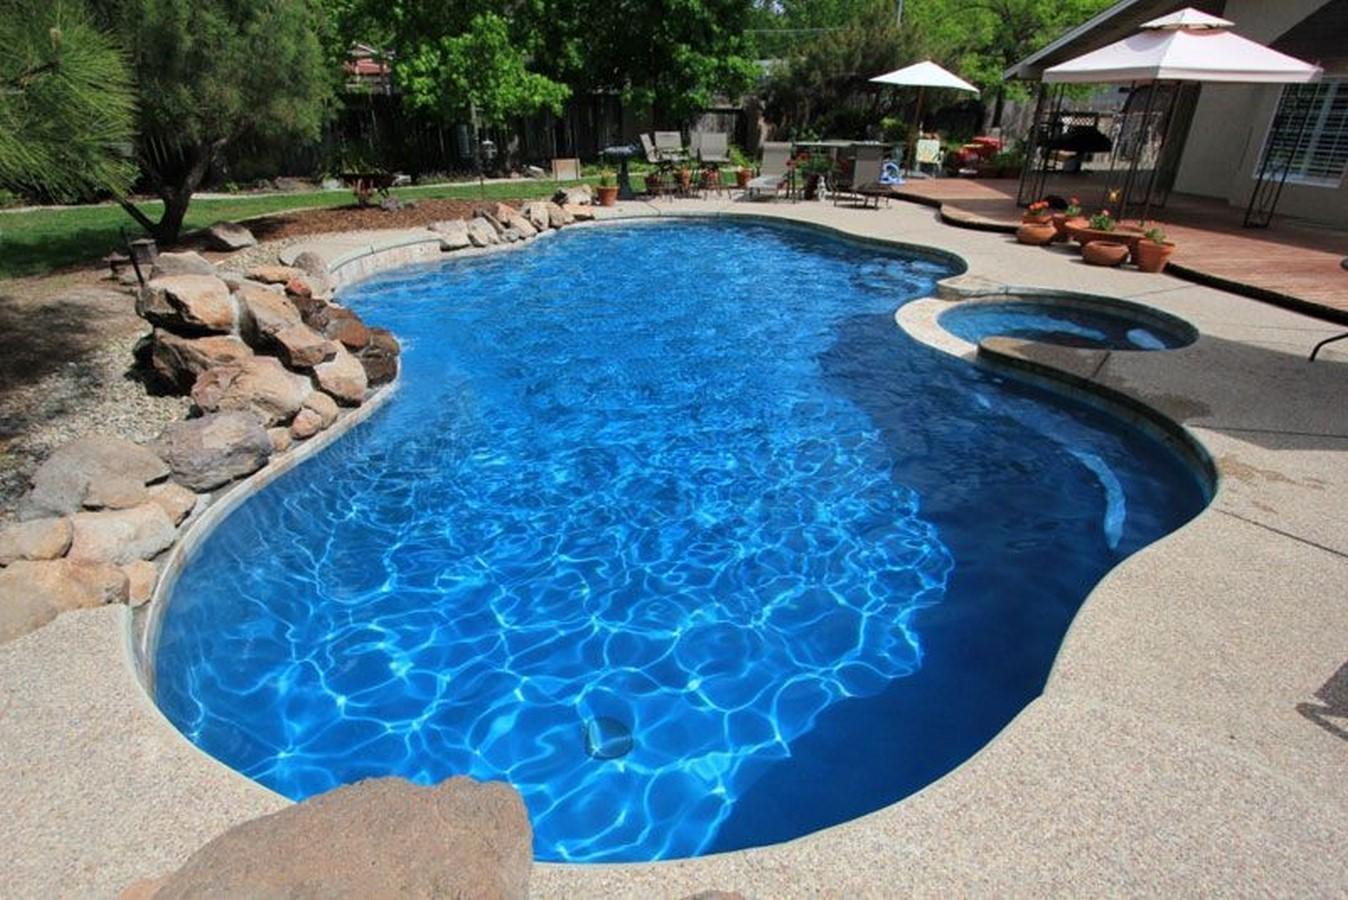 25 flooring patterns for Swimming Pools - Sheet41